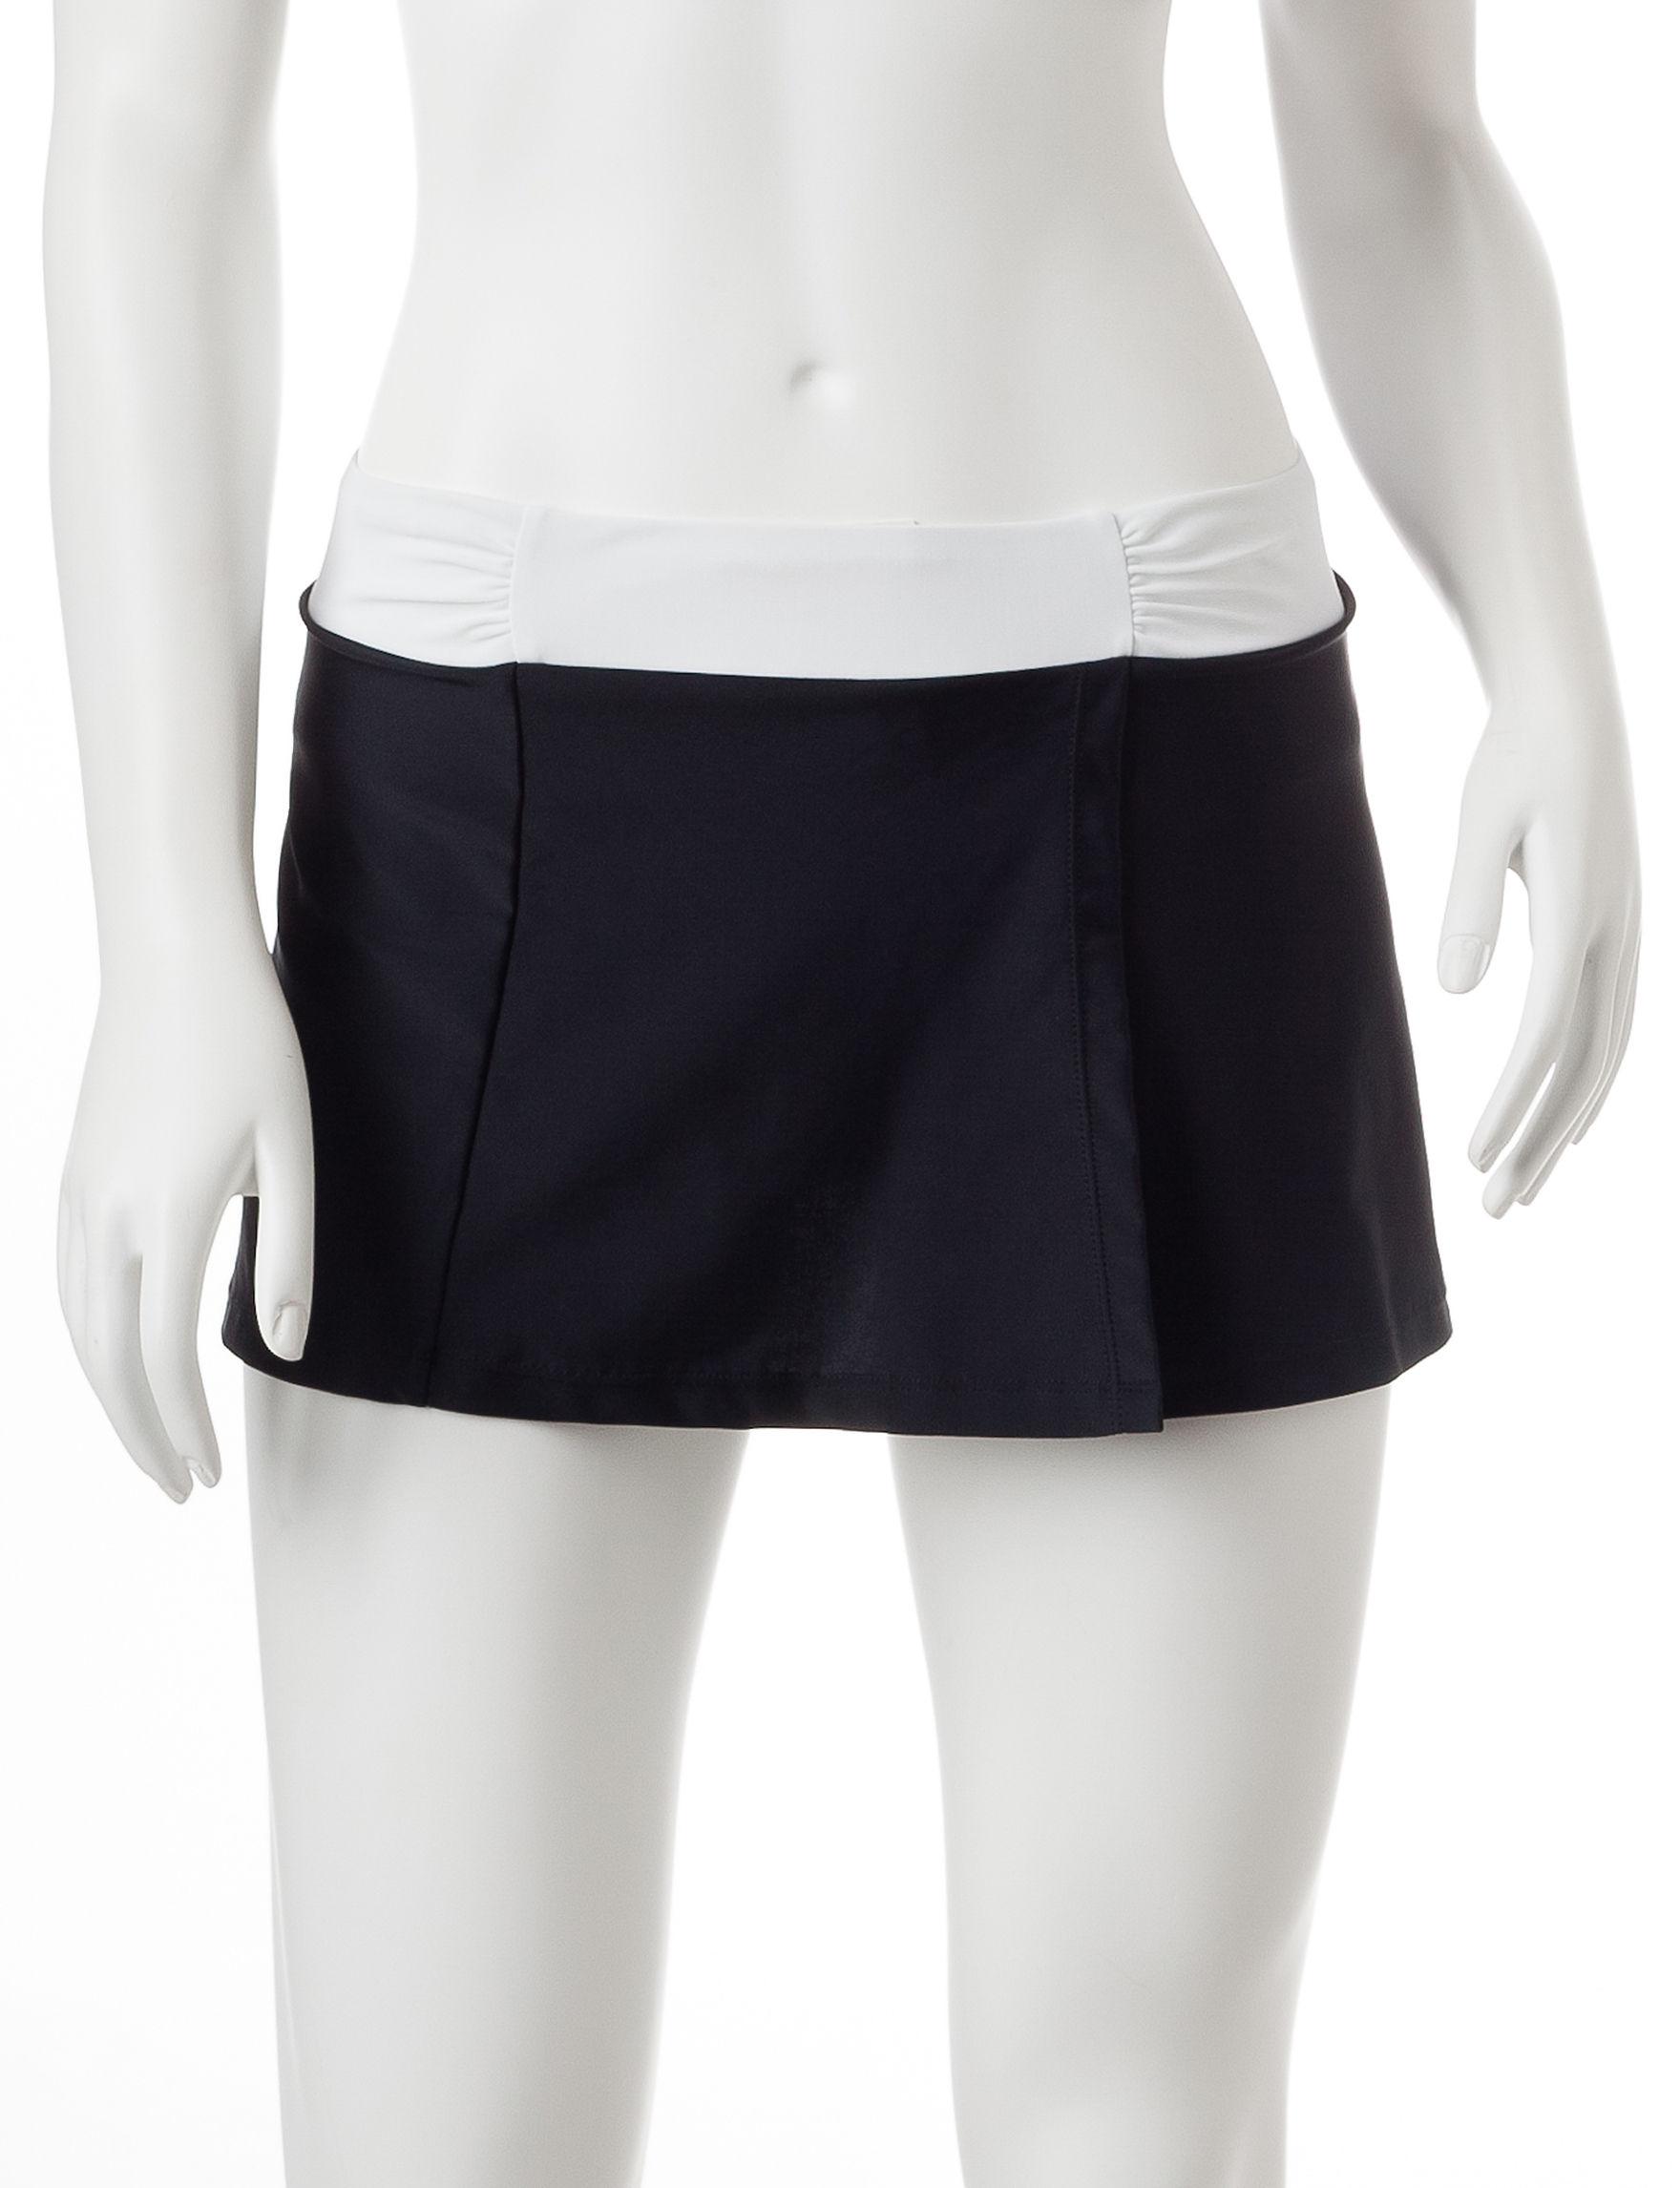 Free Country Black / White Swimsuit Bottoms Skirtini